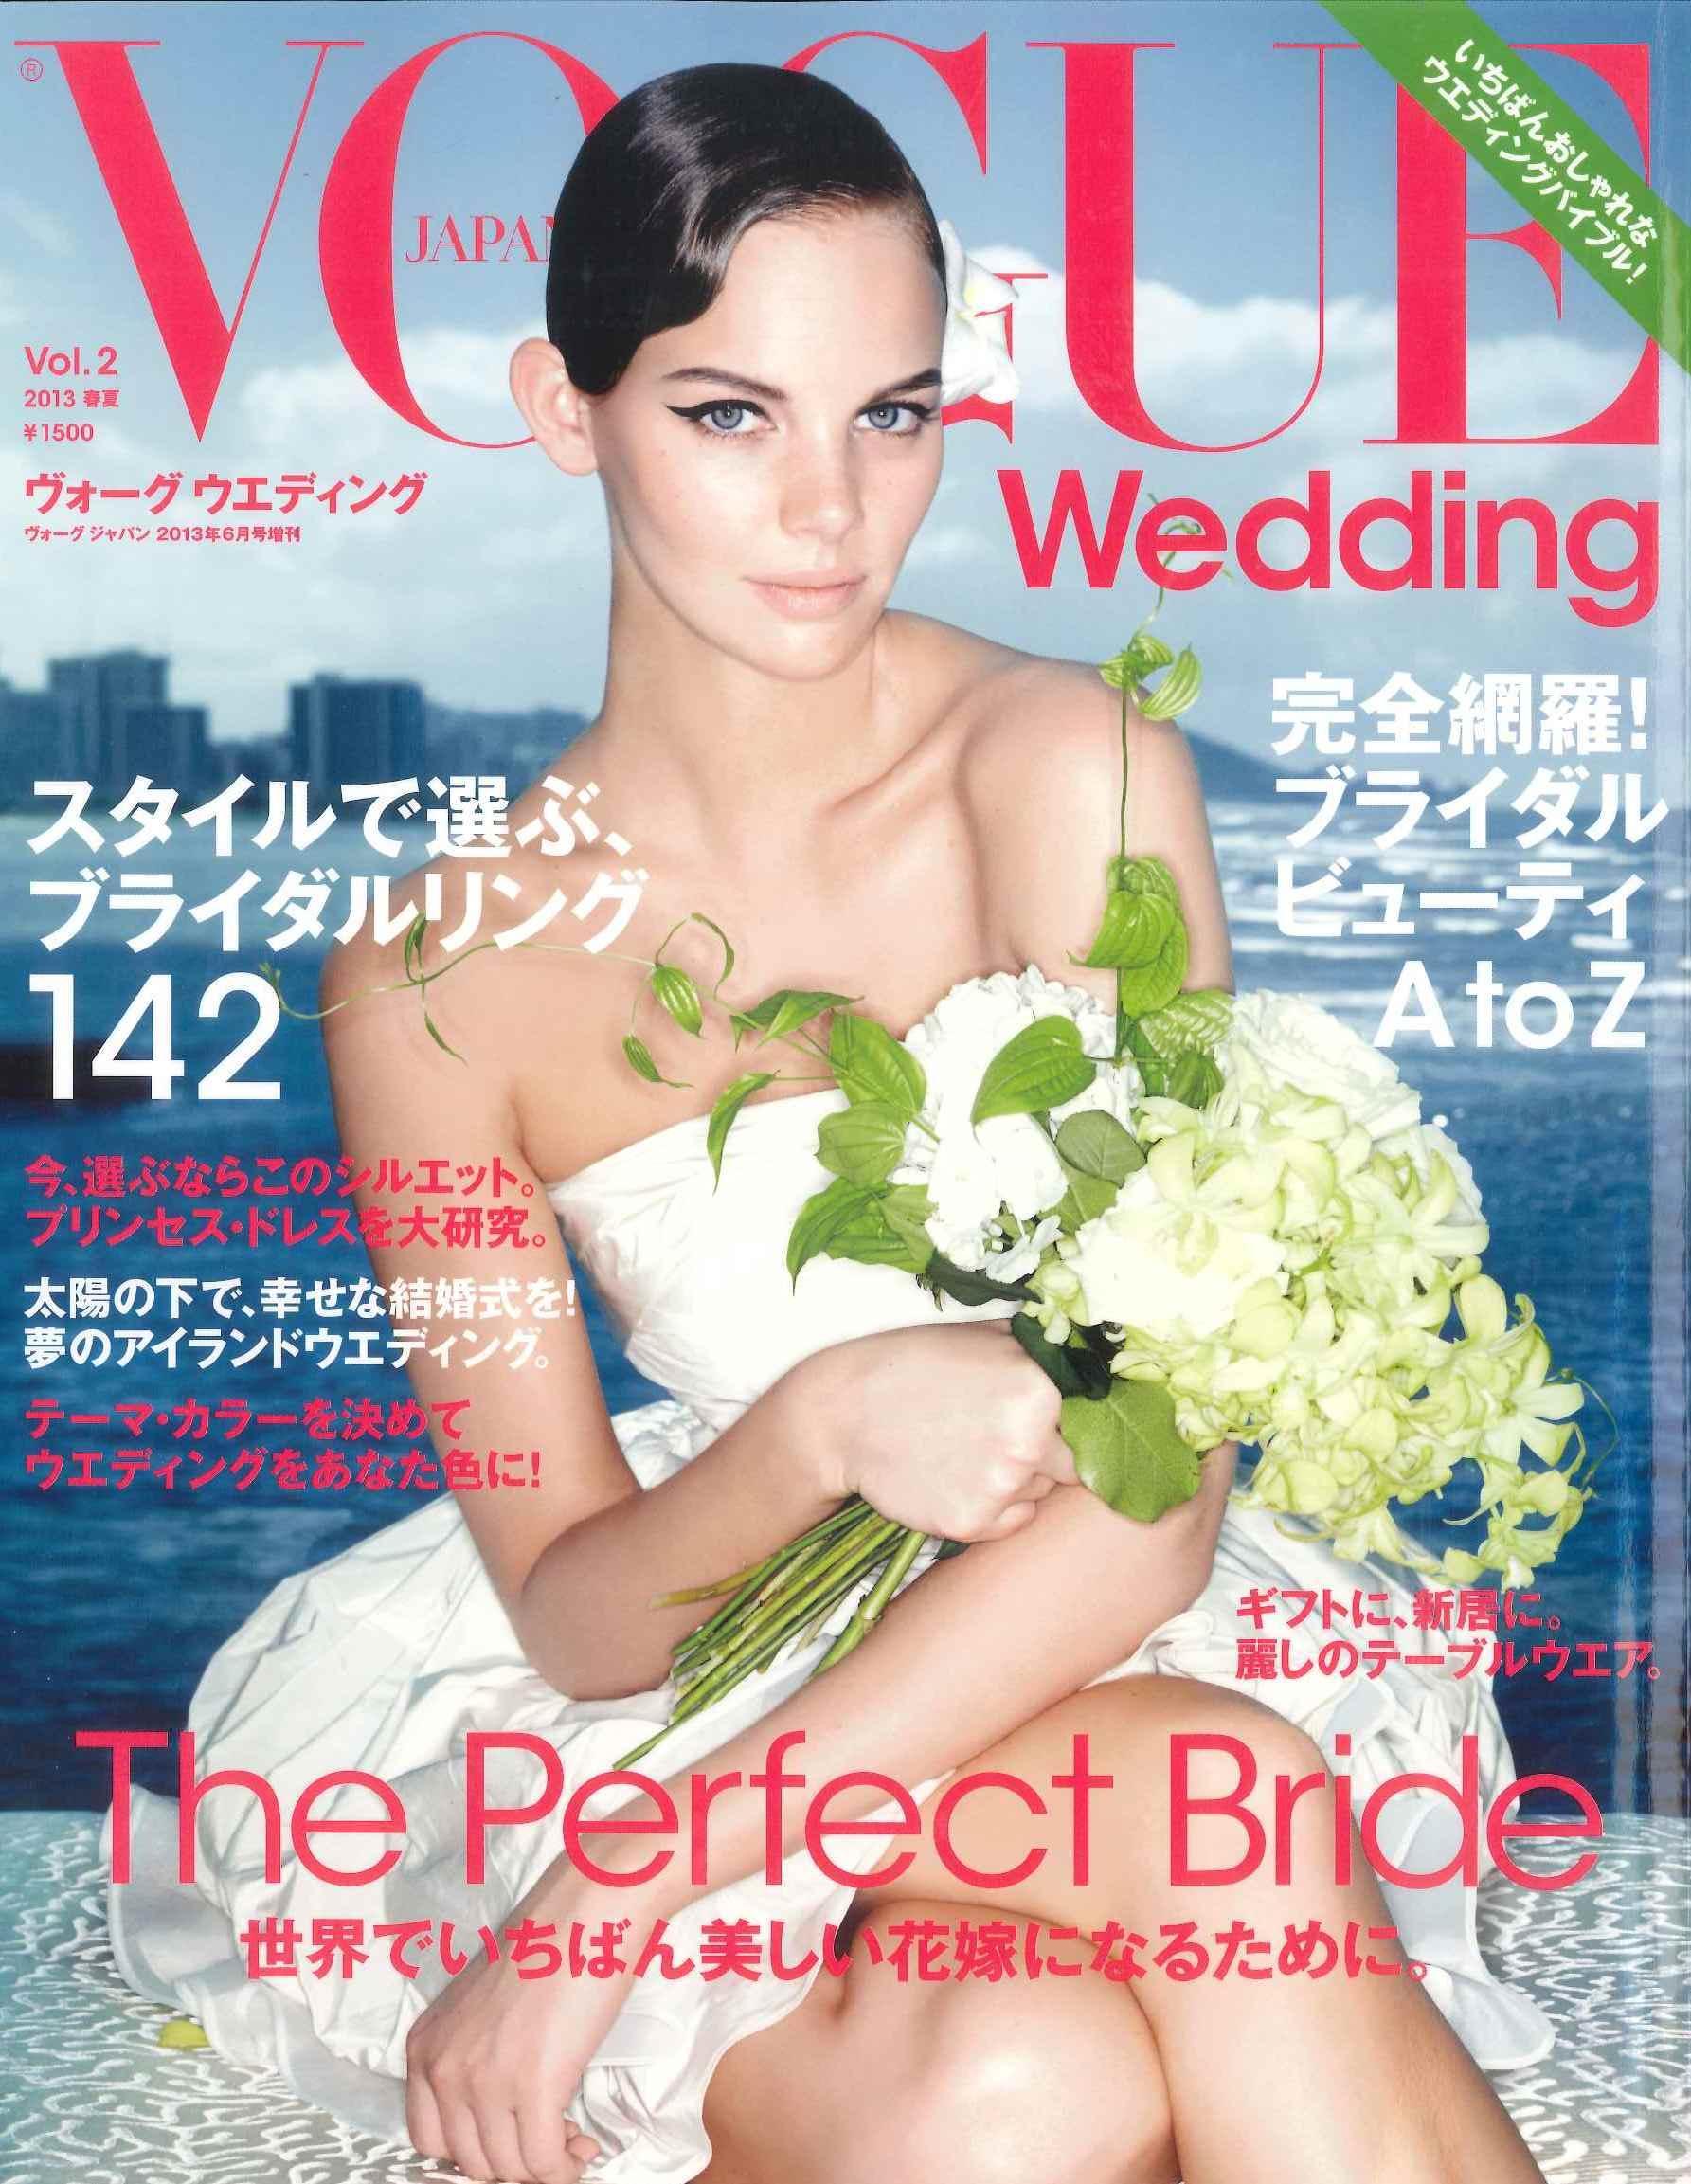 4-eyes-photography-martha-vineyard-wedding-0007.JPG